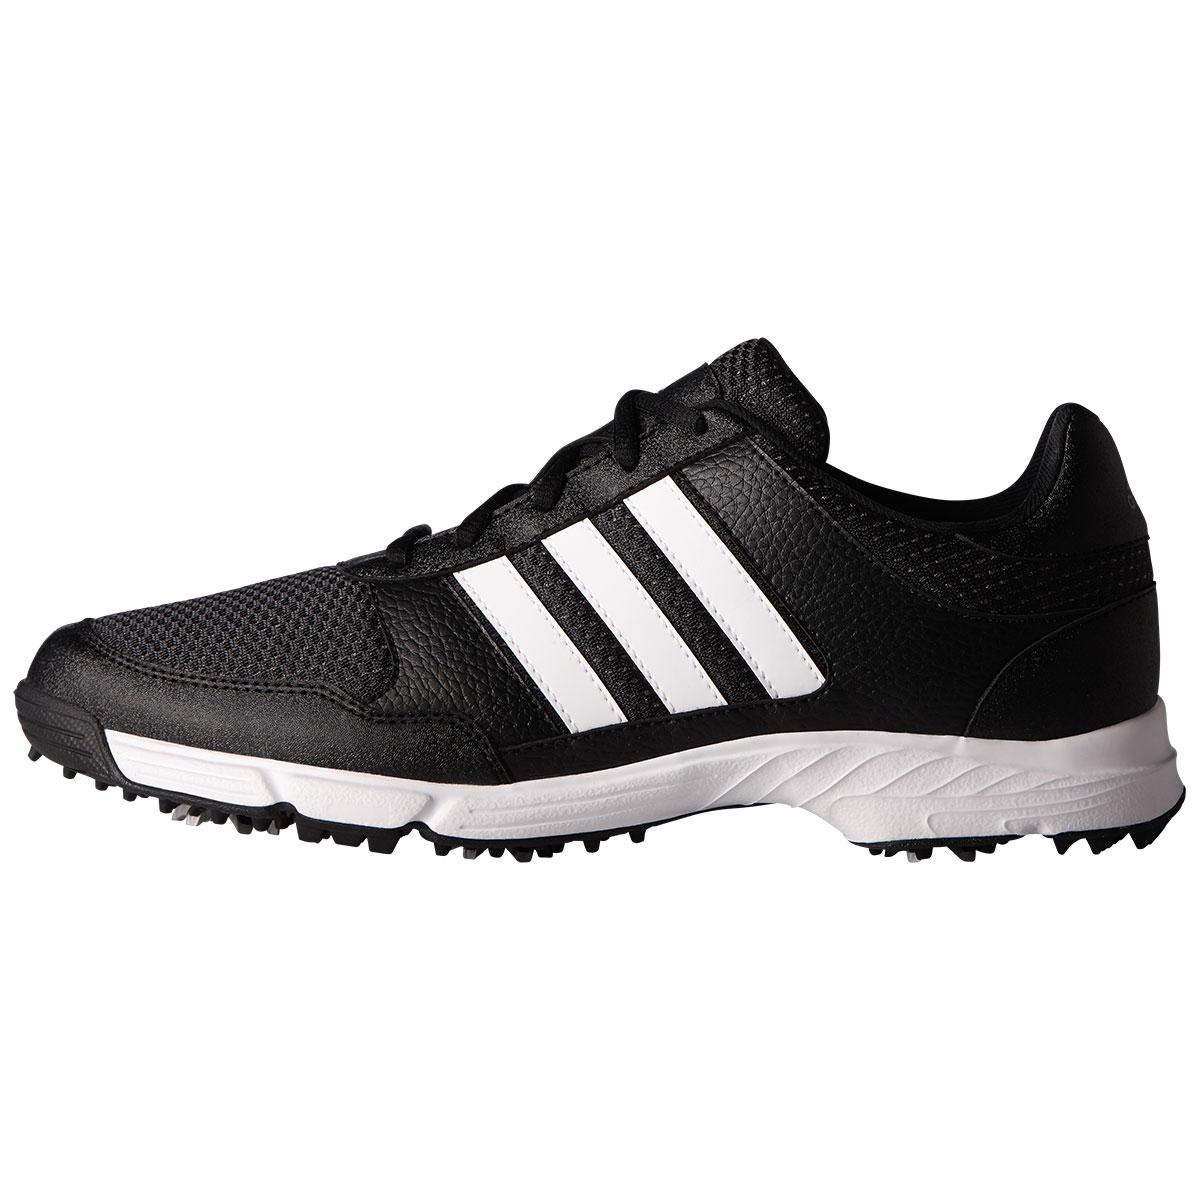 Adidas Men's 2019 Tech Response Black Golf Shoe